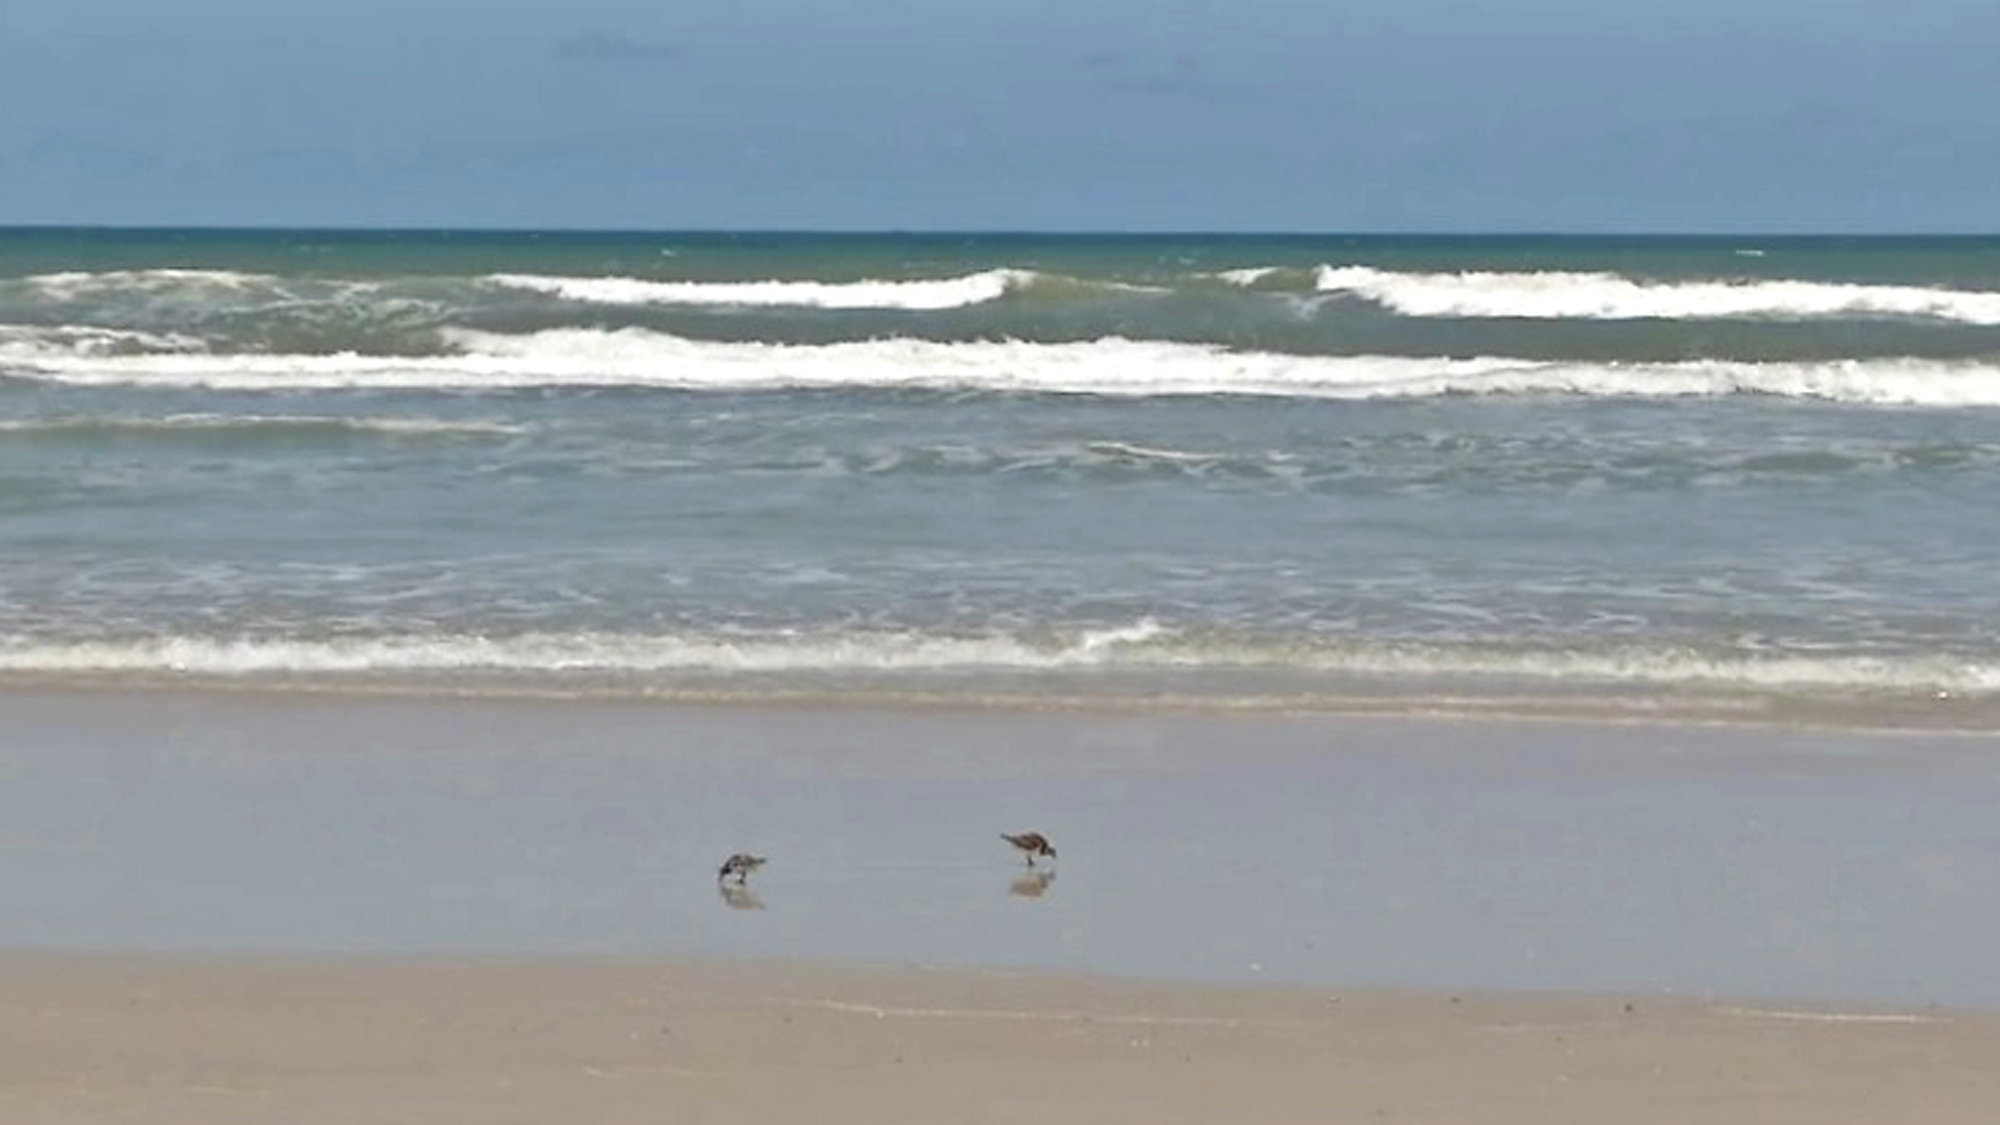 New Symrna Beach >> Surfer Bitten By Shark In New Smyrna Beach